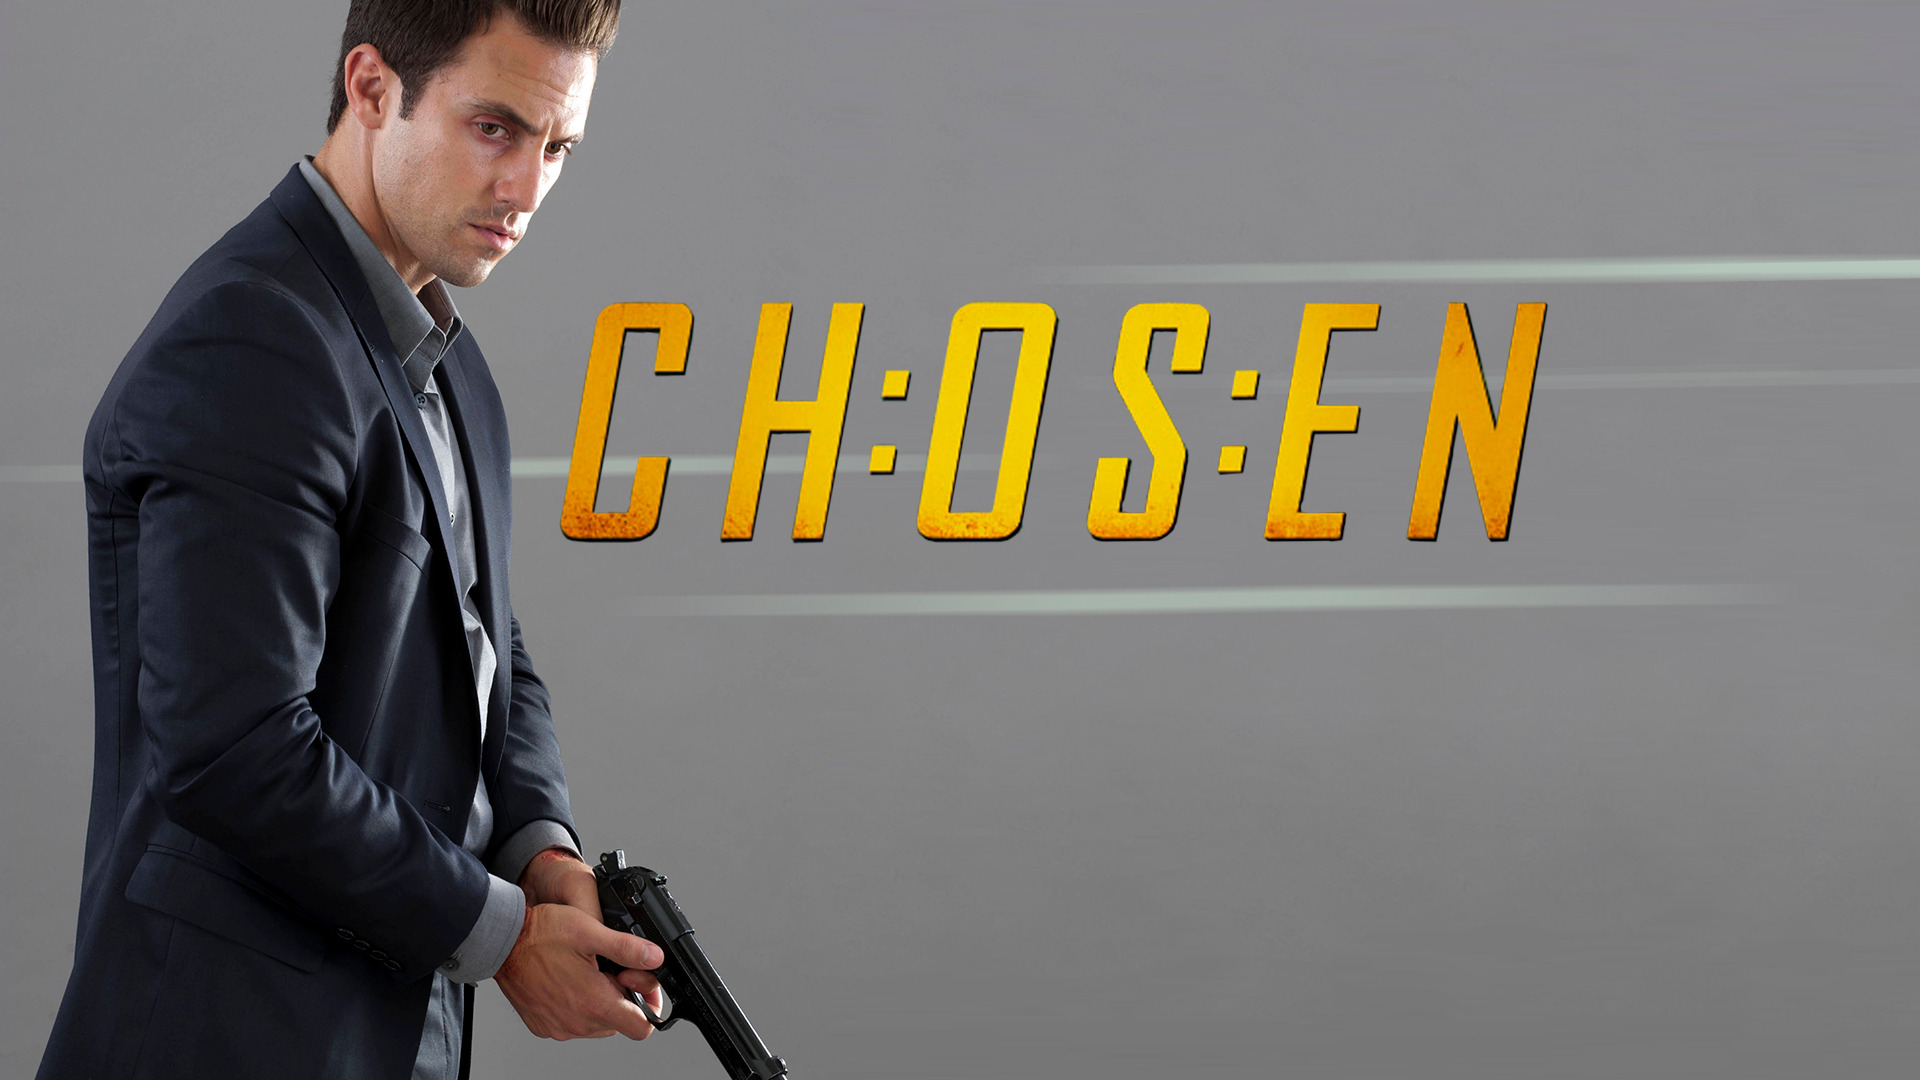 Show Chosen